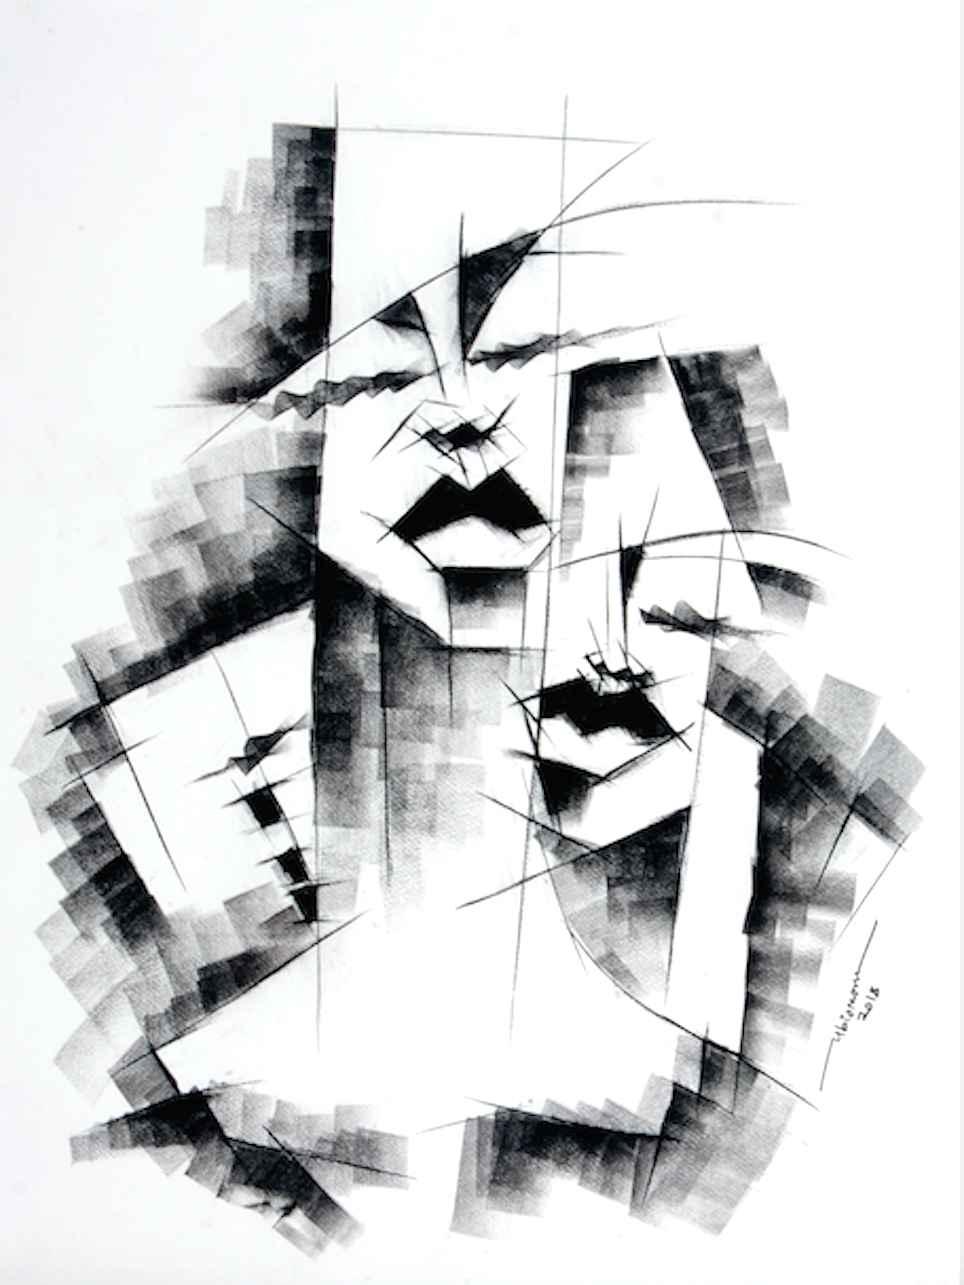 Faces II by Mr Ubiomo Ogheneroh - Masterpiece Online